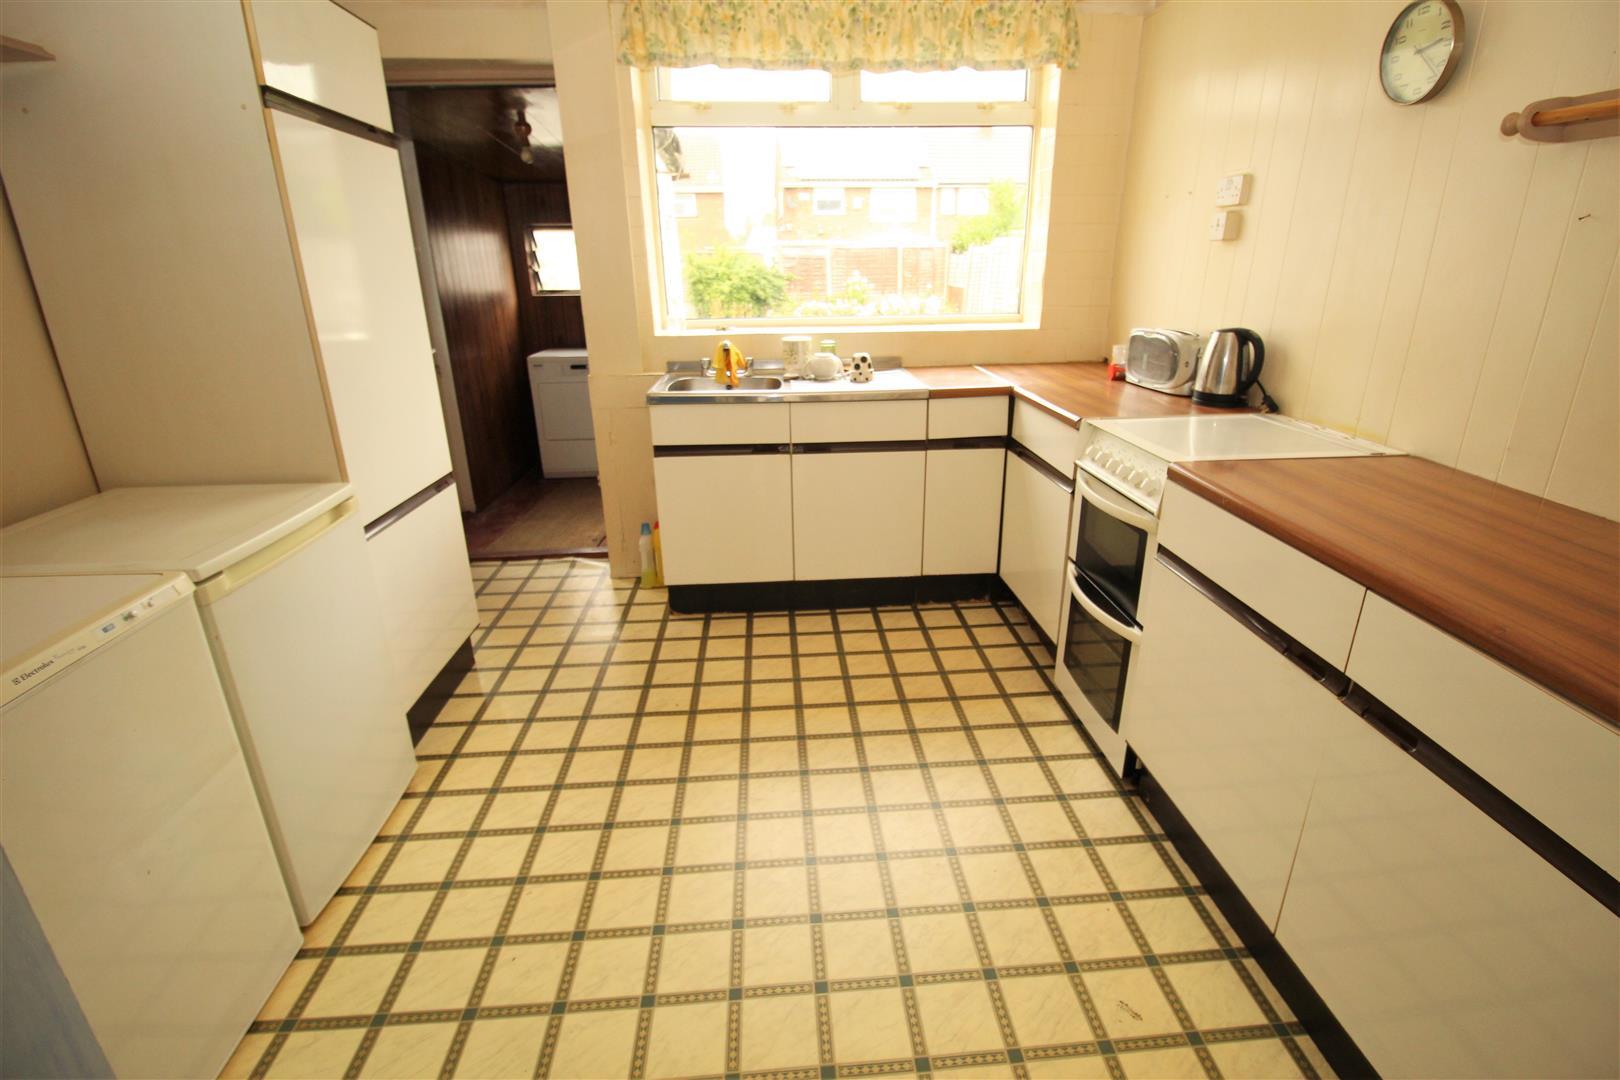 3 Bedrooms, House - Semi-Detached, Sandhurst Drive, Liverpool